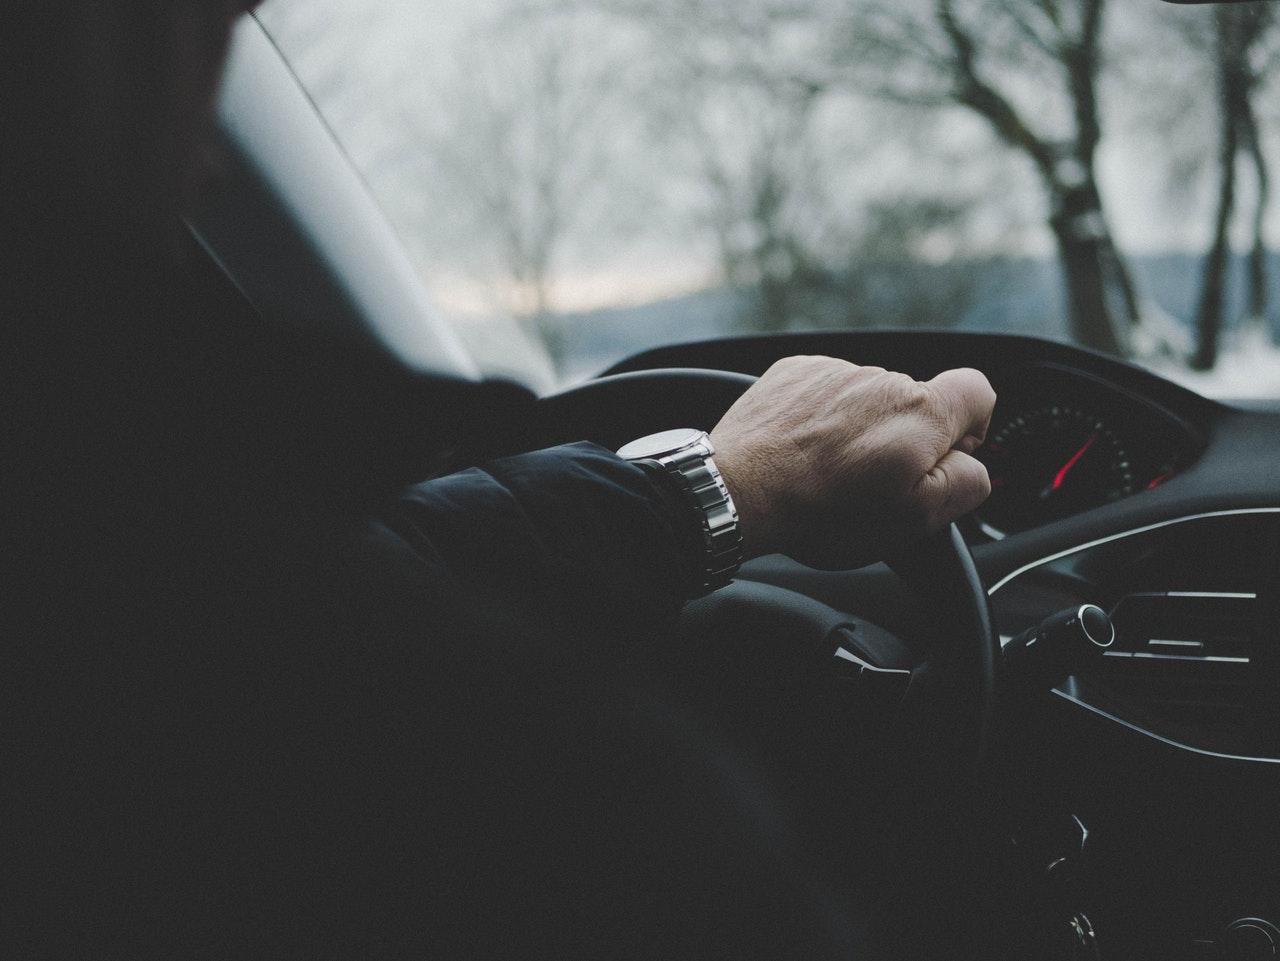 Drive a car long distance